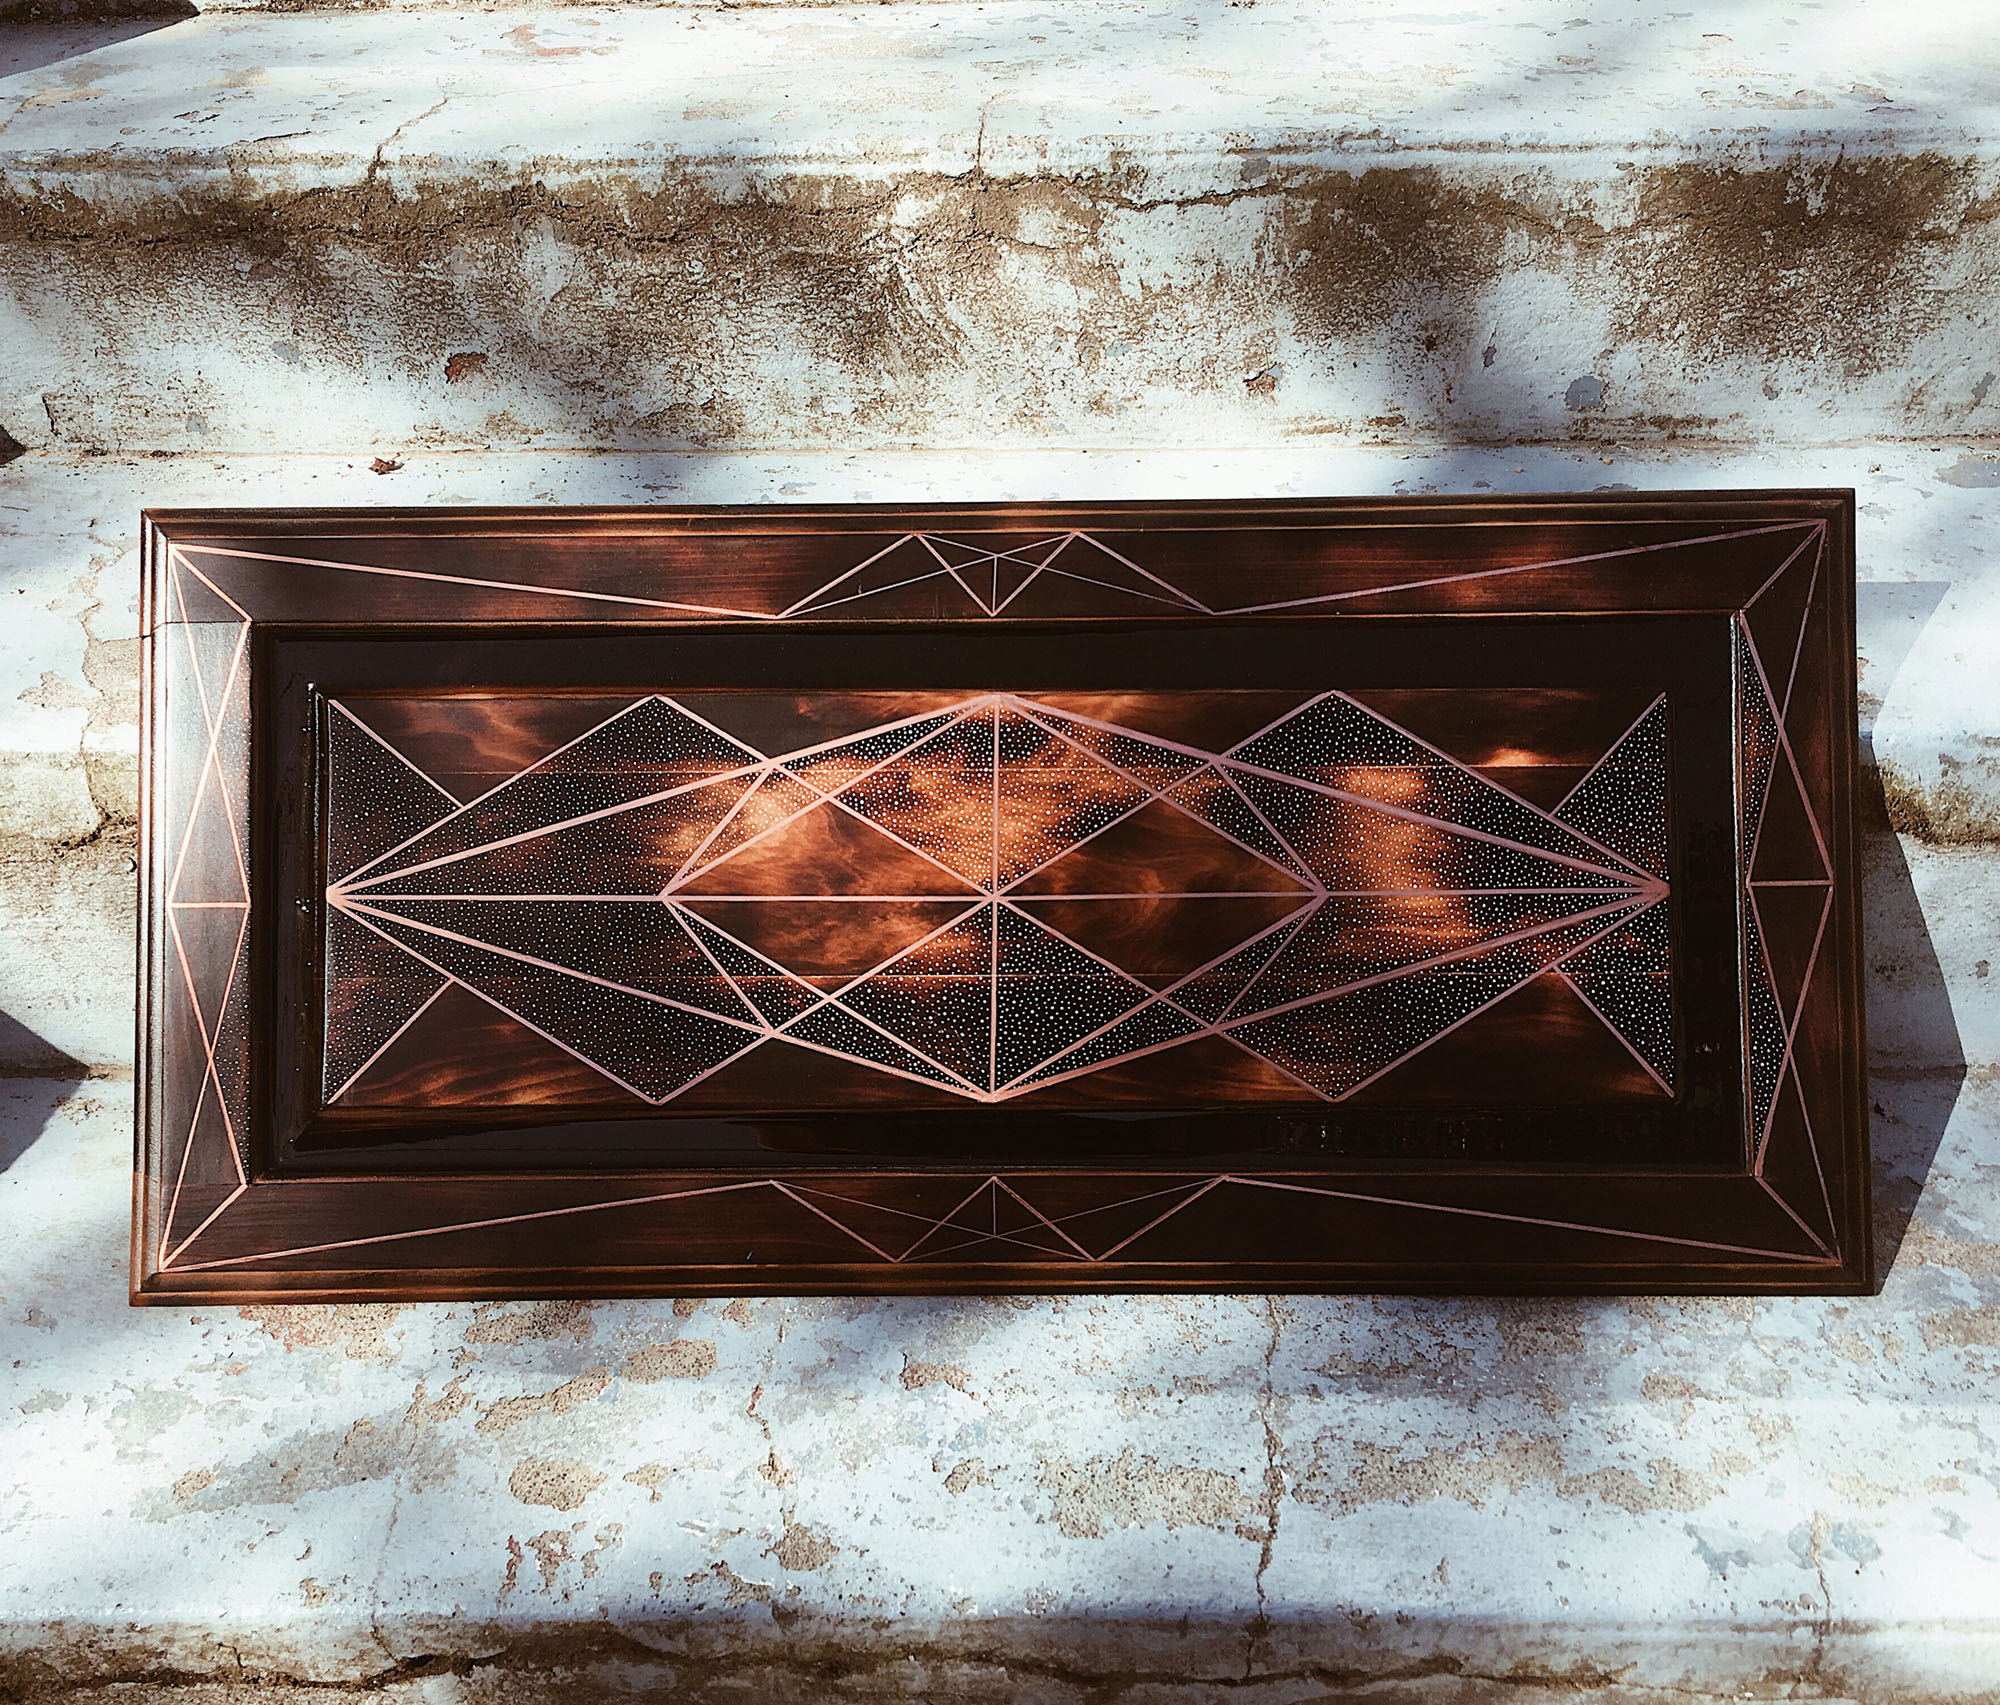 Universal Prerequisite, 2018, Acrylic and Pen on Burned Reclaimed Wood Panel, 13 x 28 inch, $400